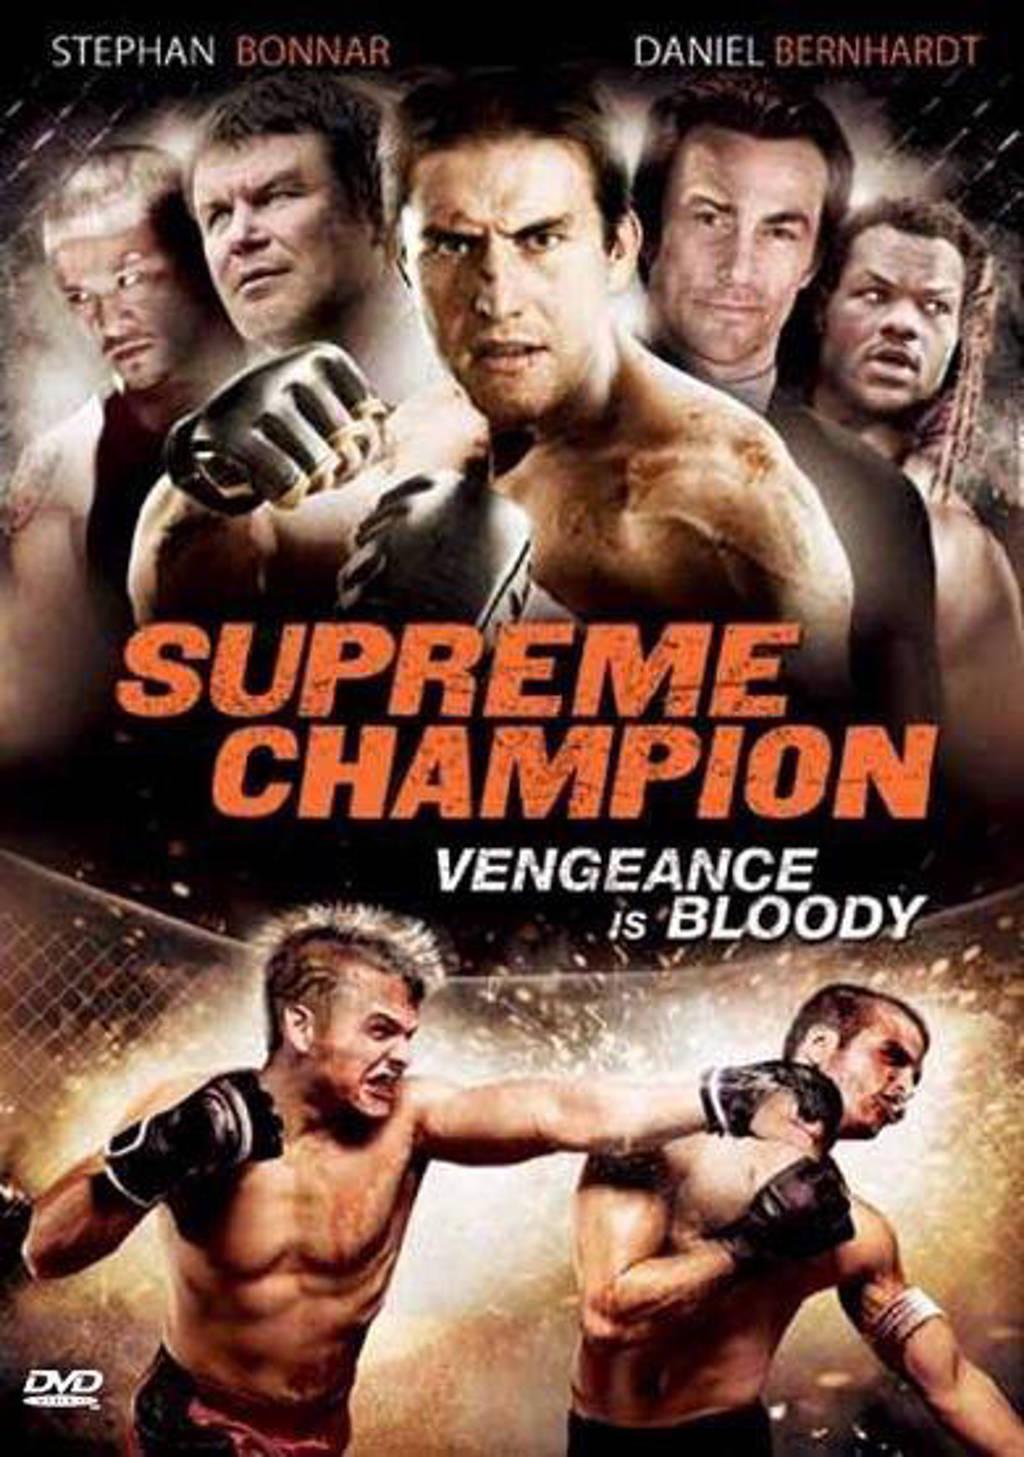 Supreme champion (DVD)